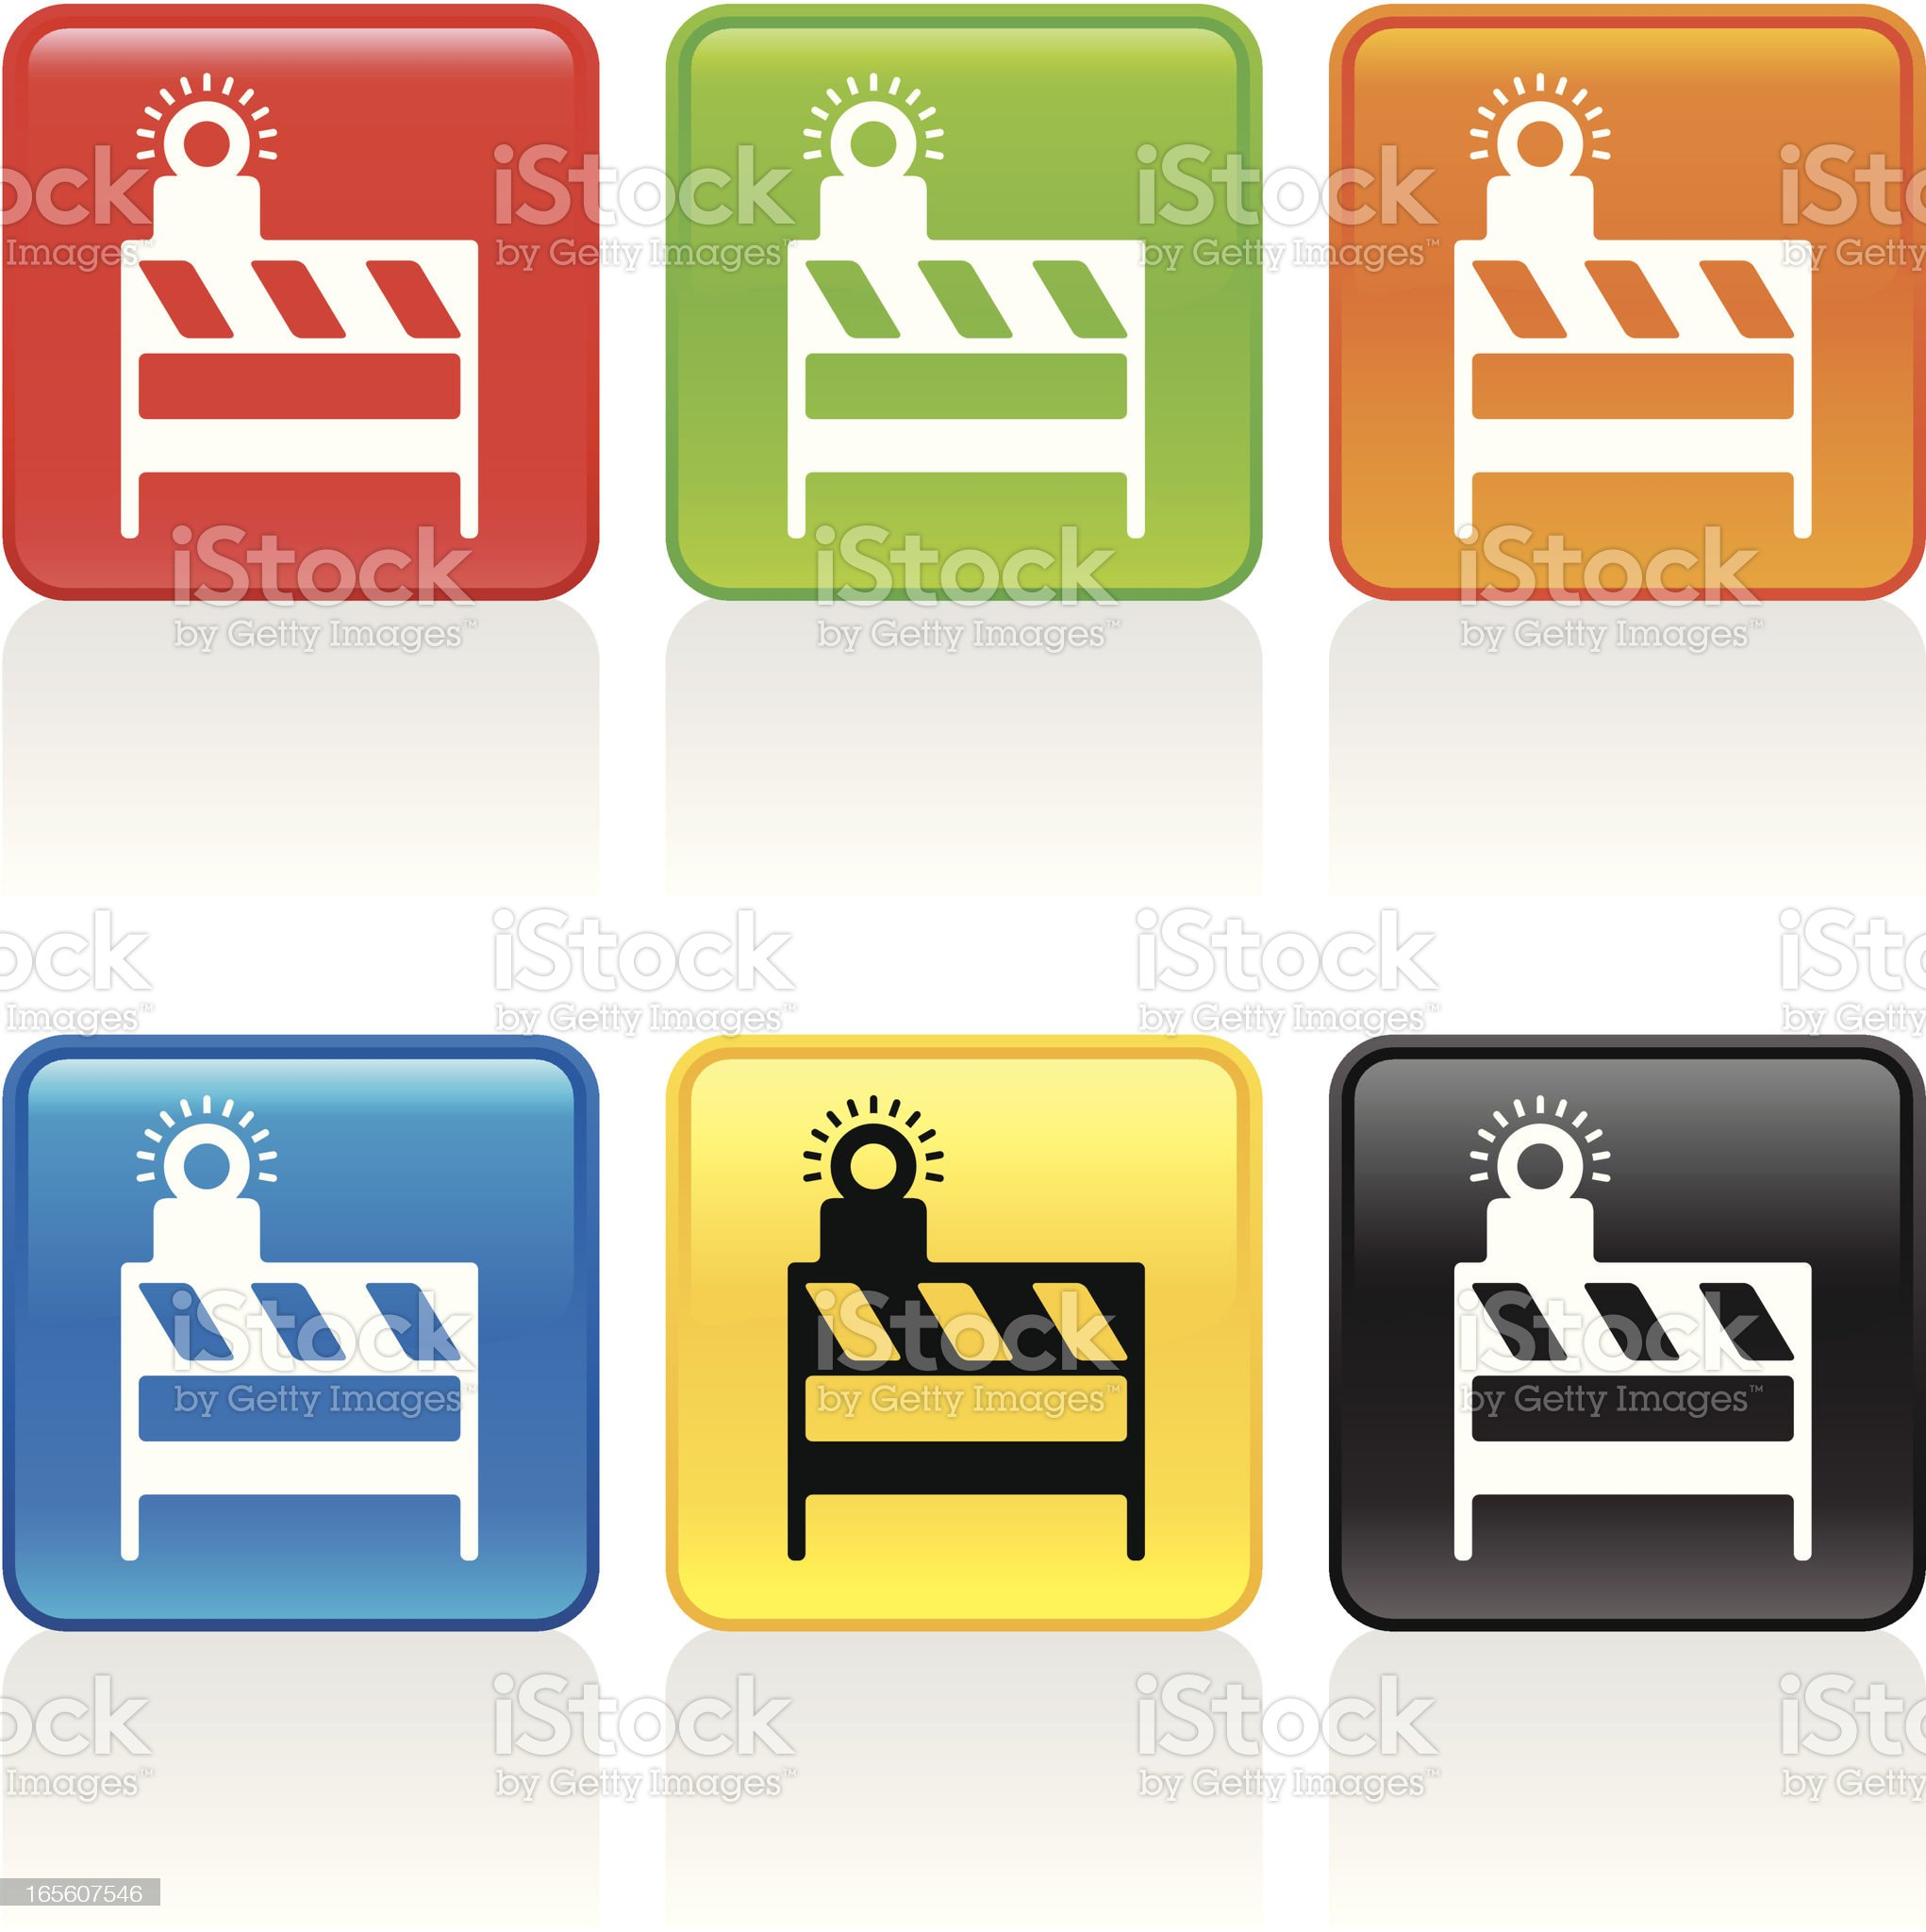 Barricade Icon royalty-free stock vector art